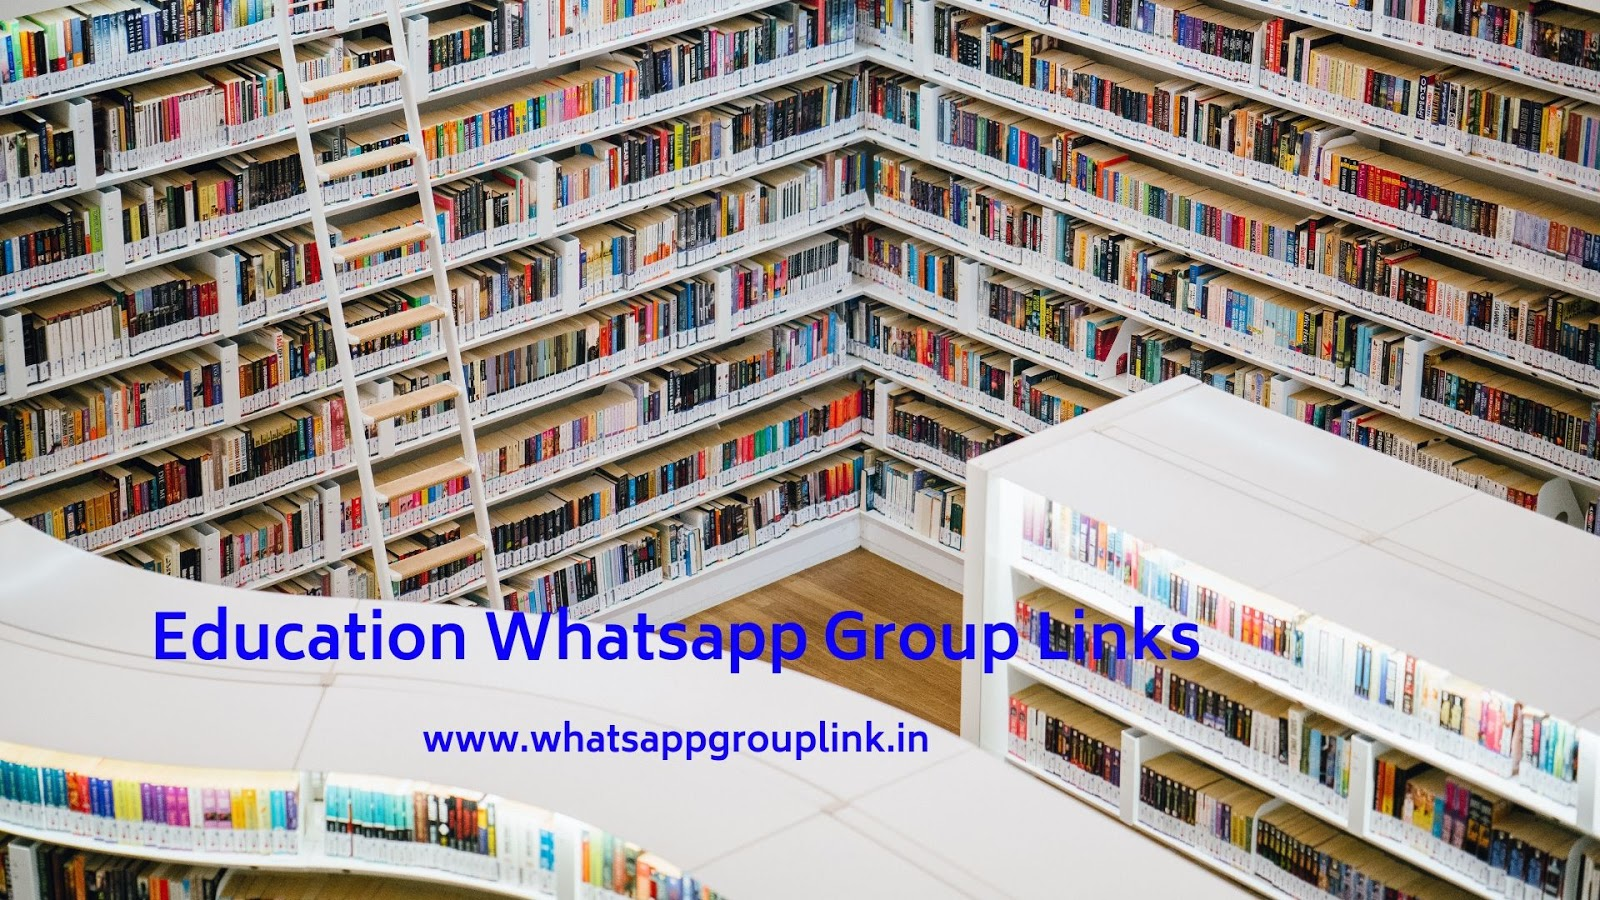 Whatsapp Group Link: Education Whatsapp Group Links